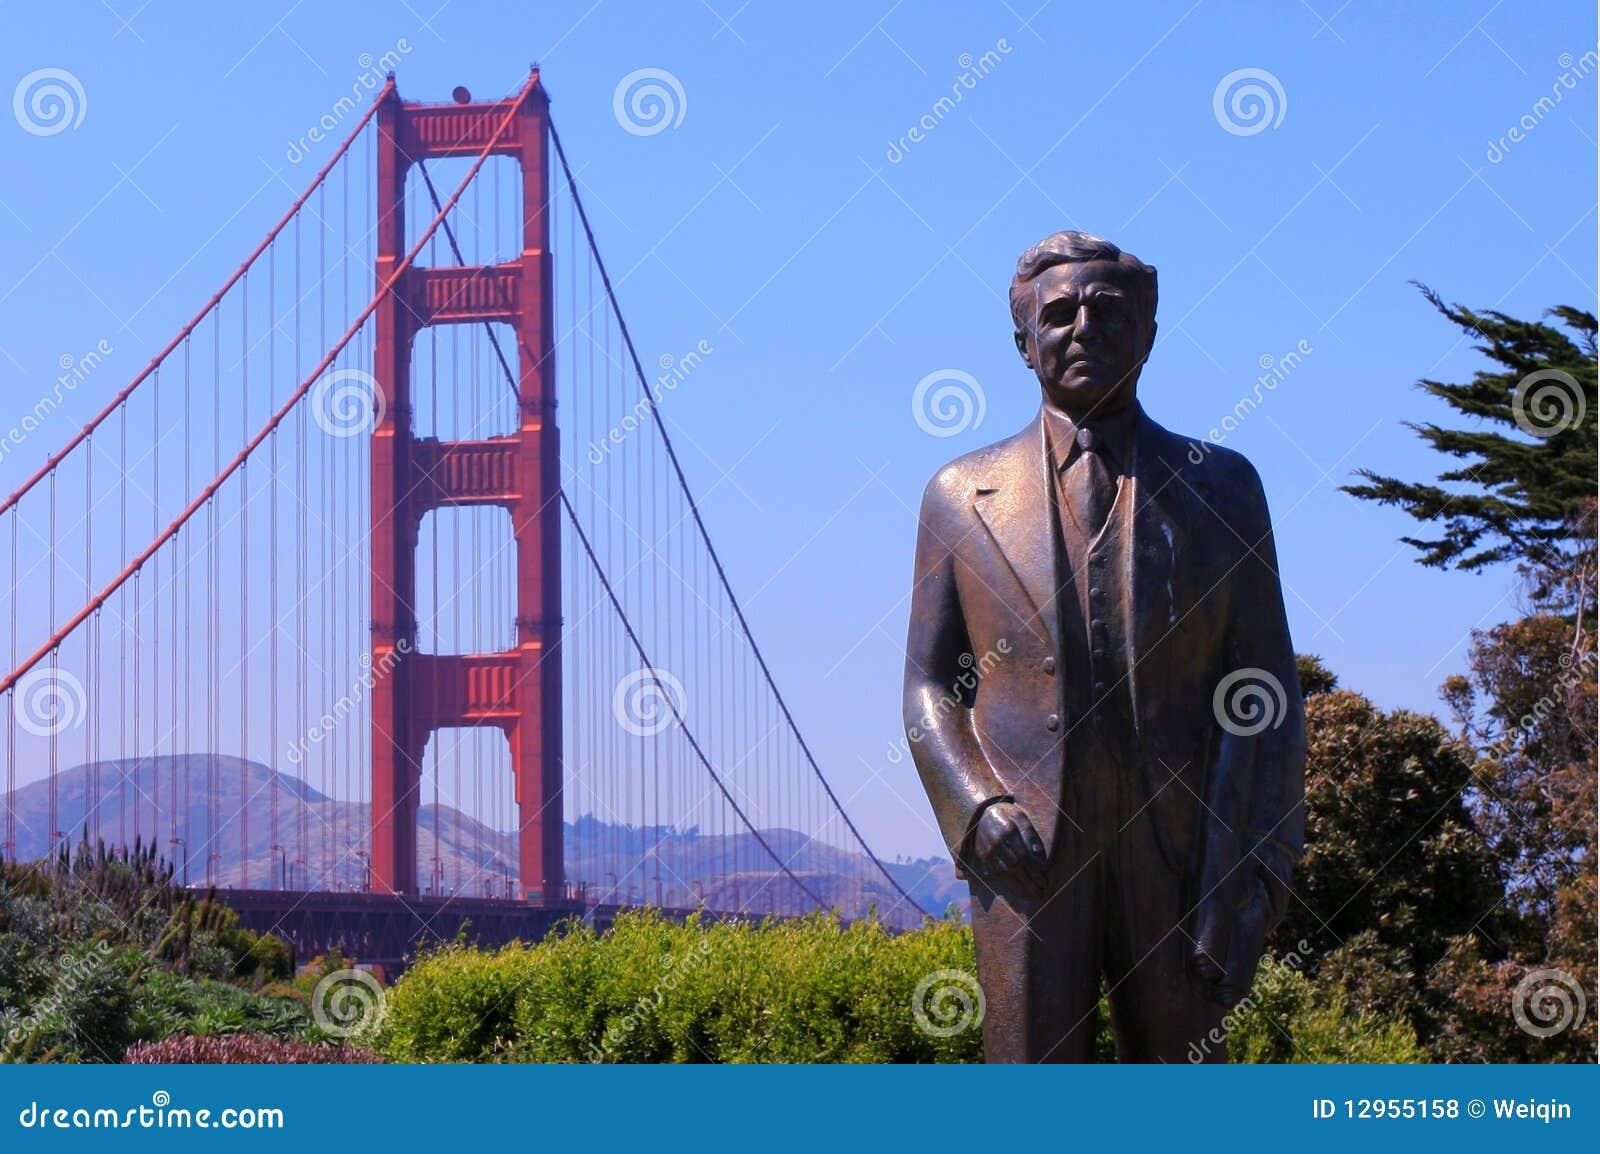 Golden Gate Bridge Royalty Free Stock Photos Image 12955158